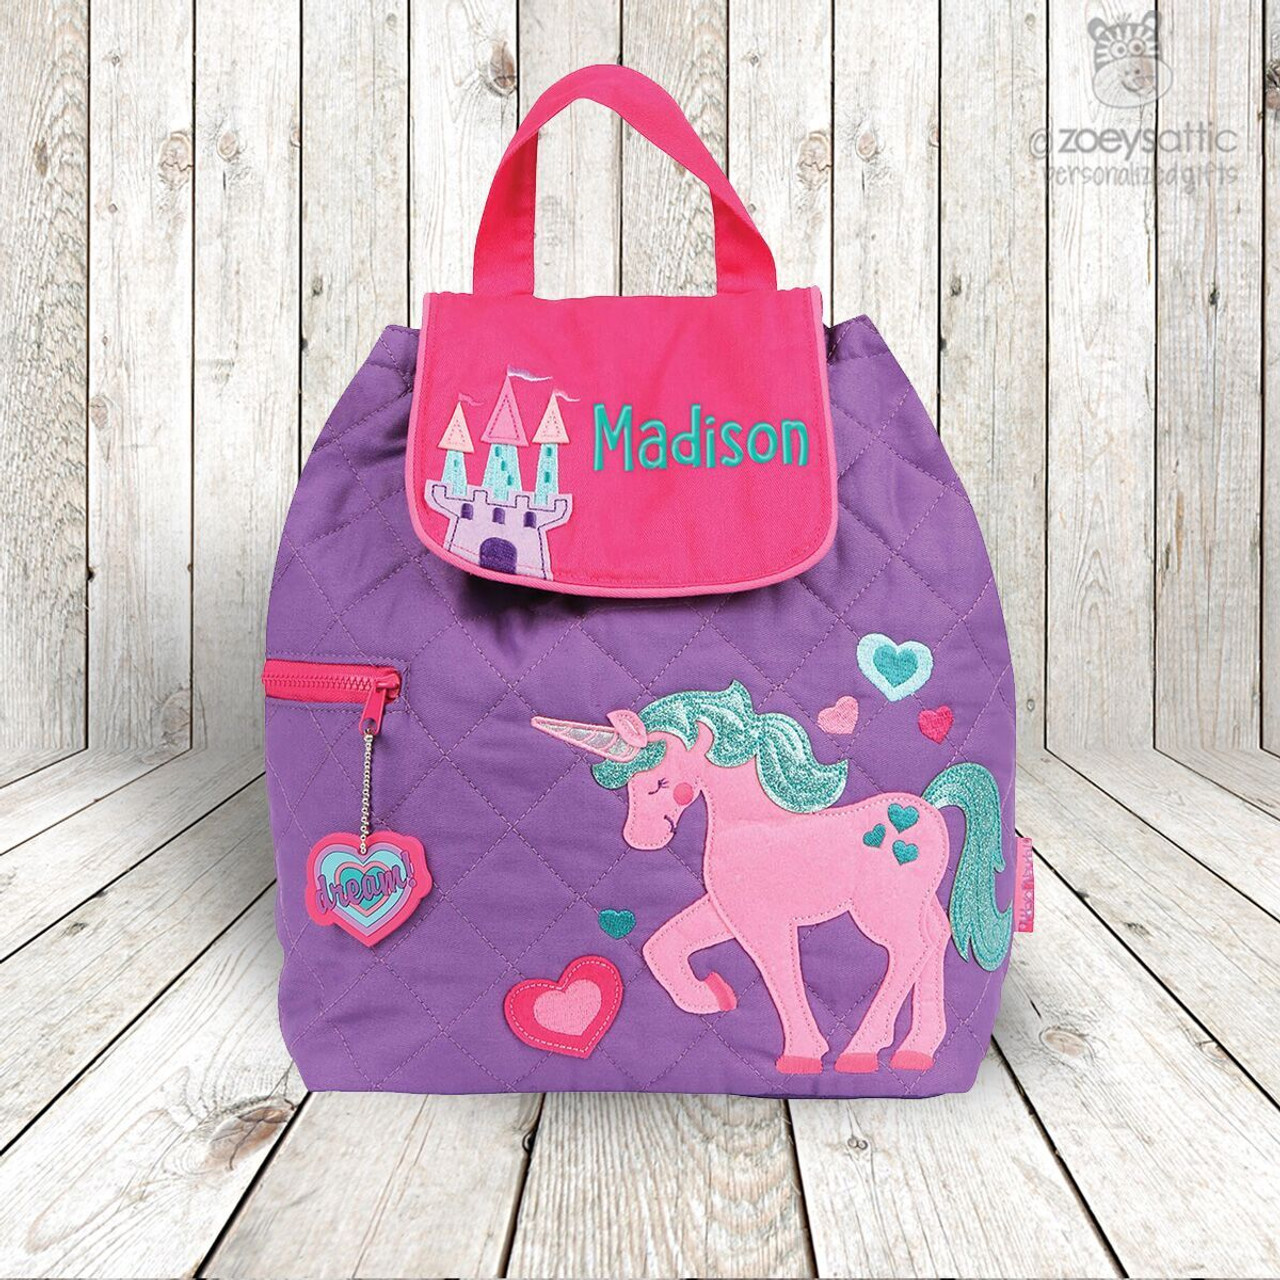 Personalised Kids Backpack Pink Name Rucksack School Bag Embroidered Unicorn